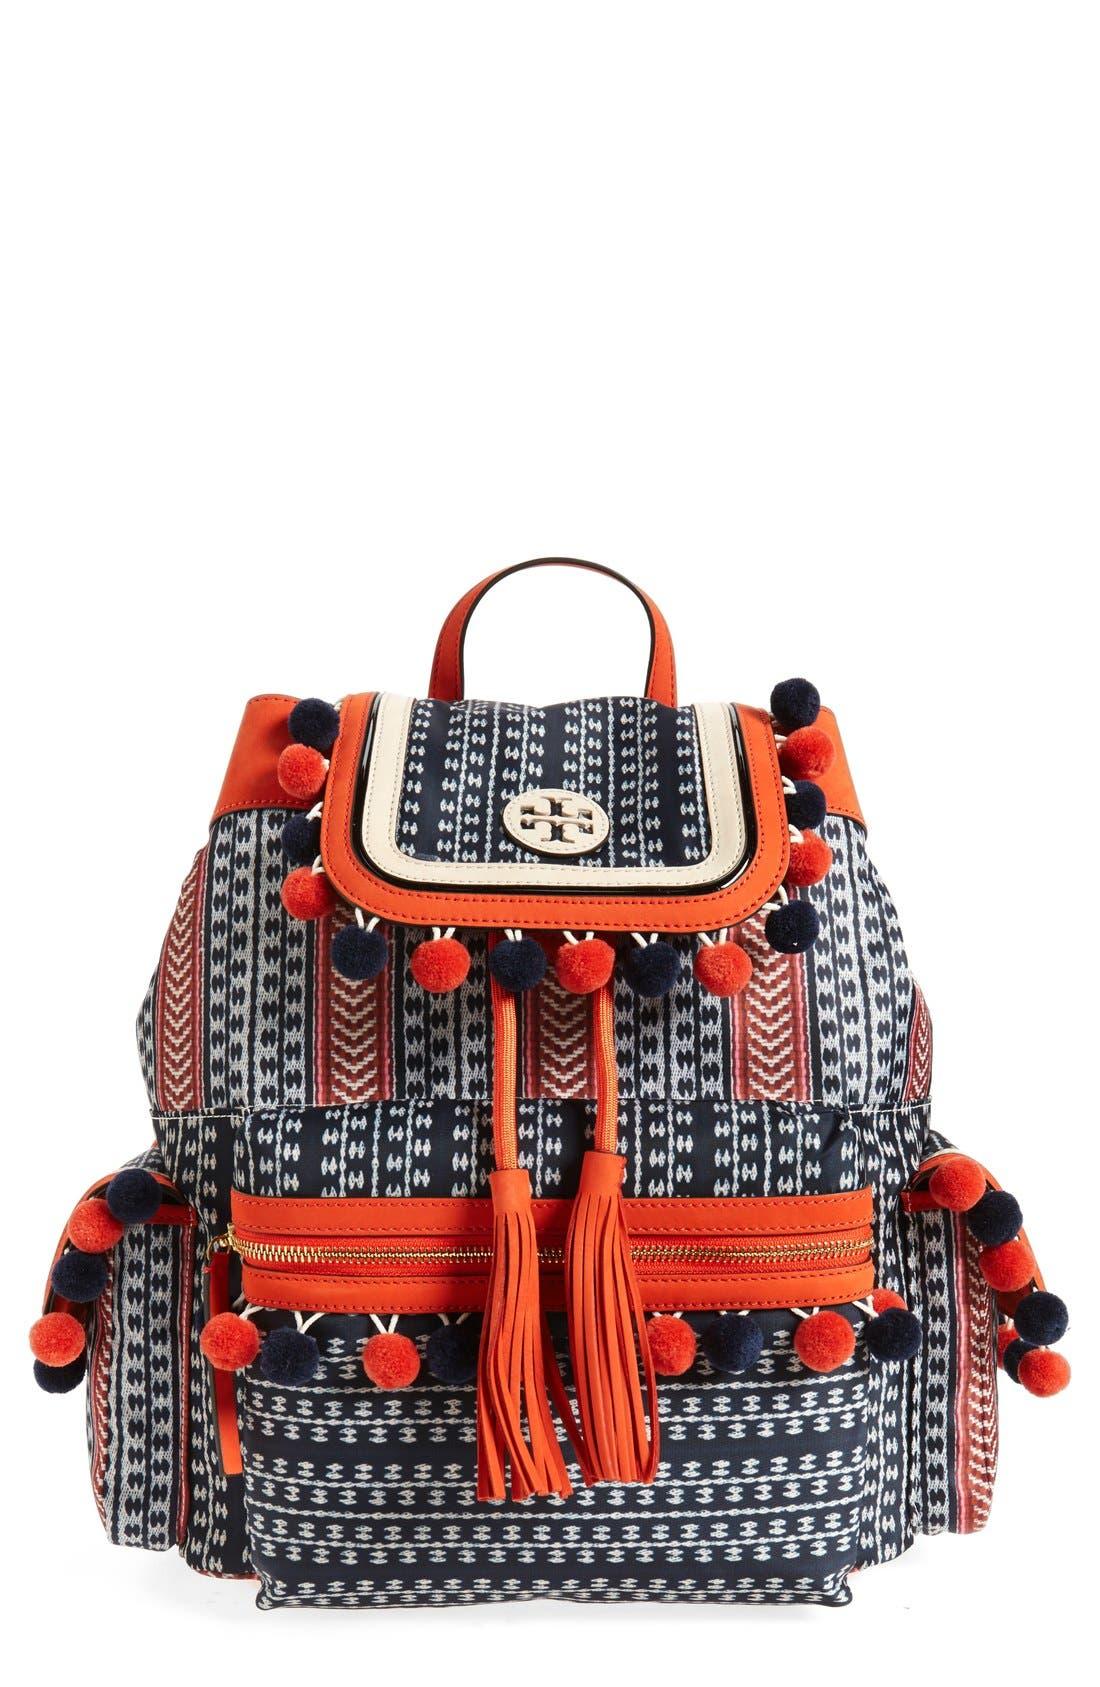 6c46e186cd0 Buy tory burch backpack diaper bag   OFF37% Discounted